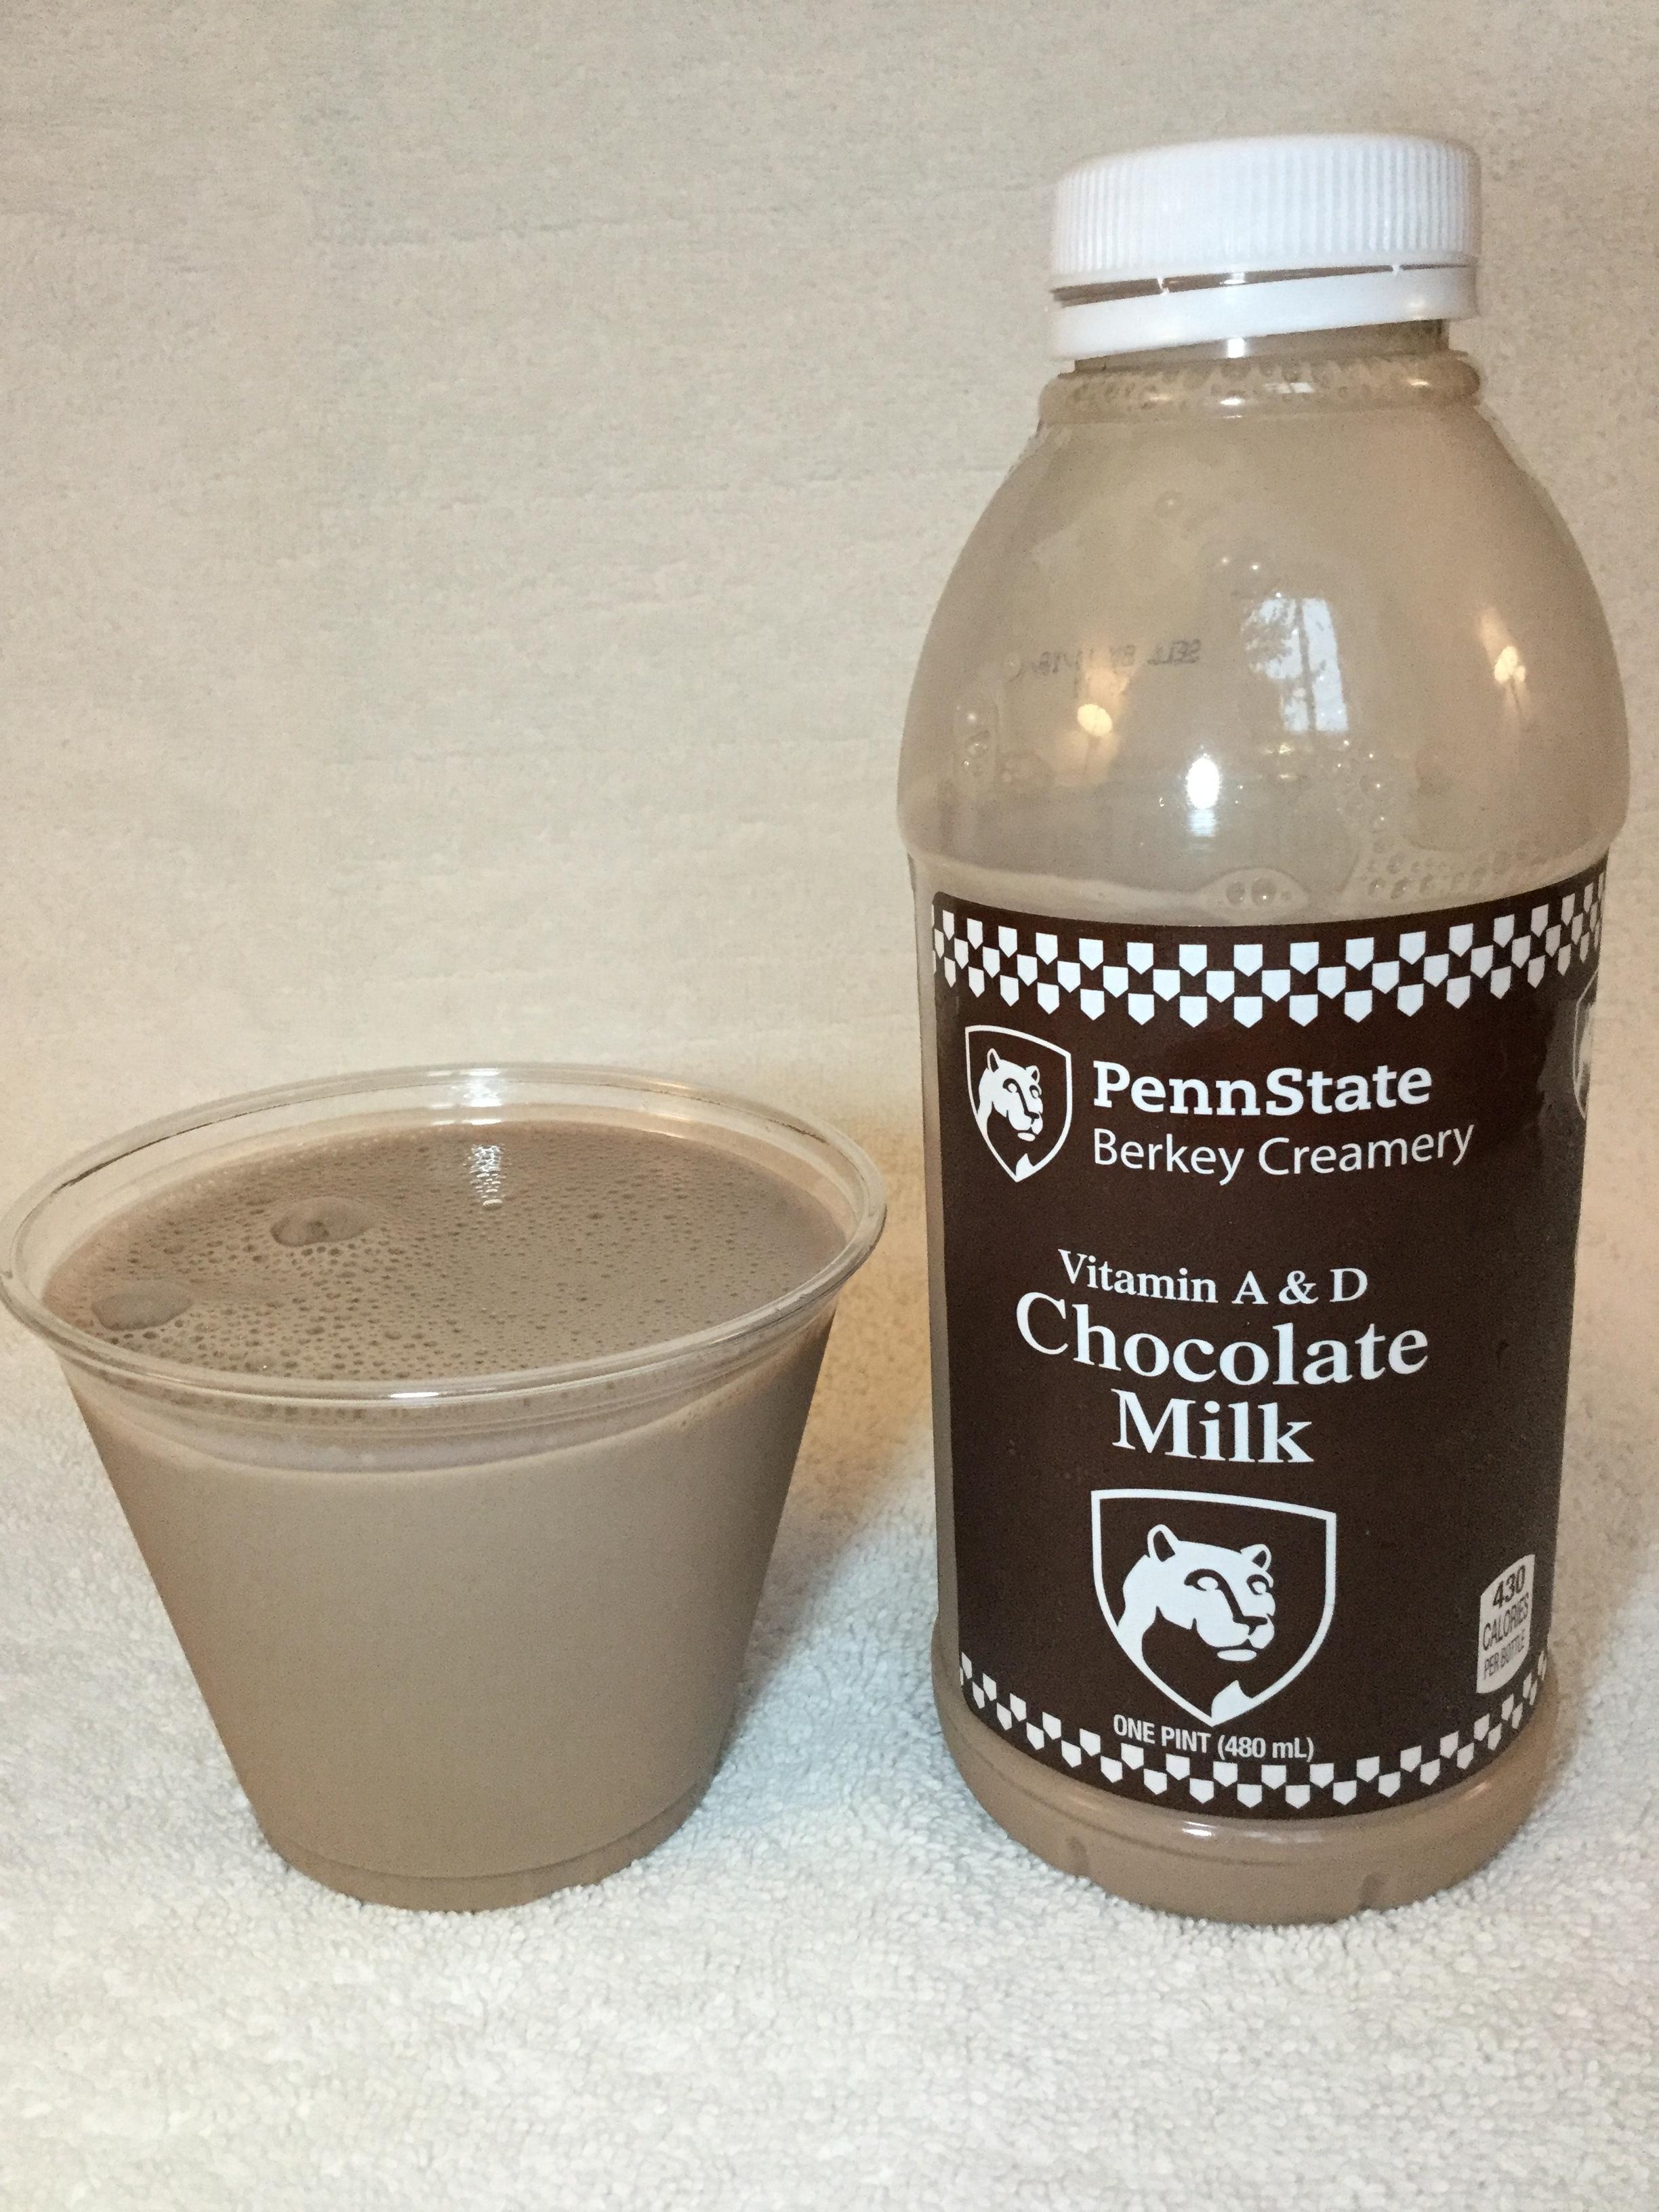 Penn State Berkey Creamery Chocolate Milk Cup